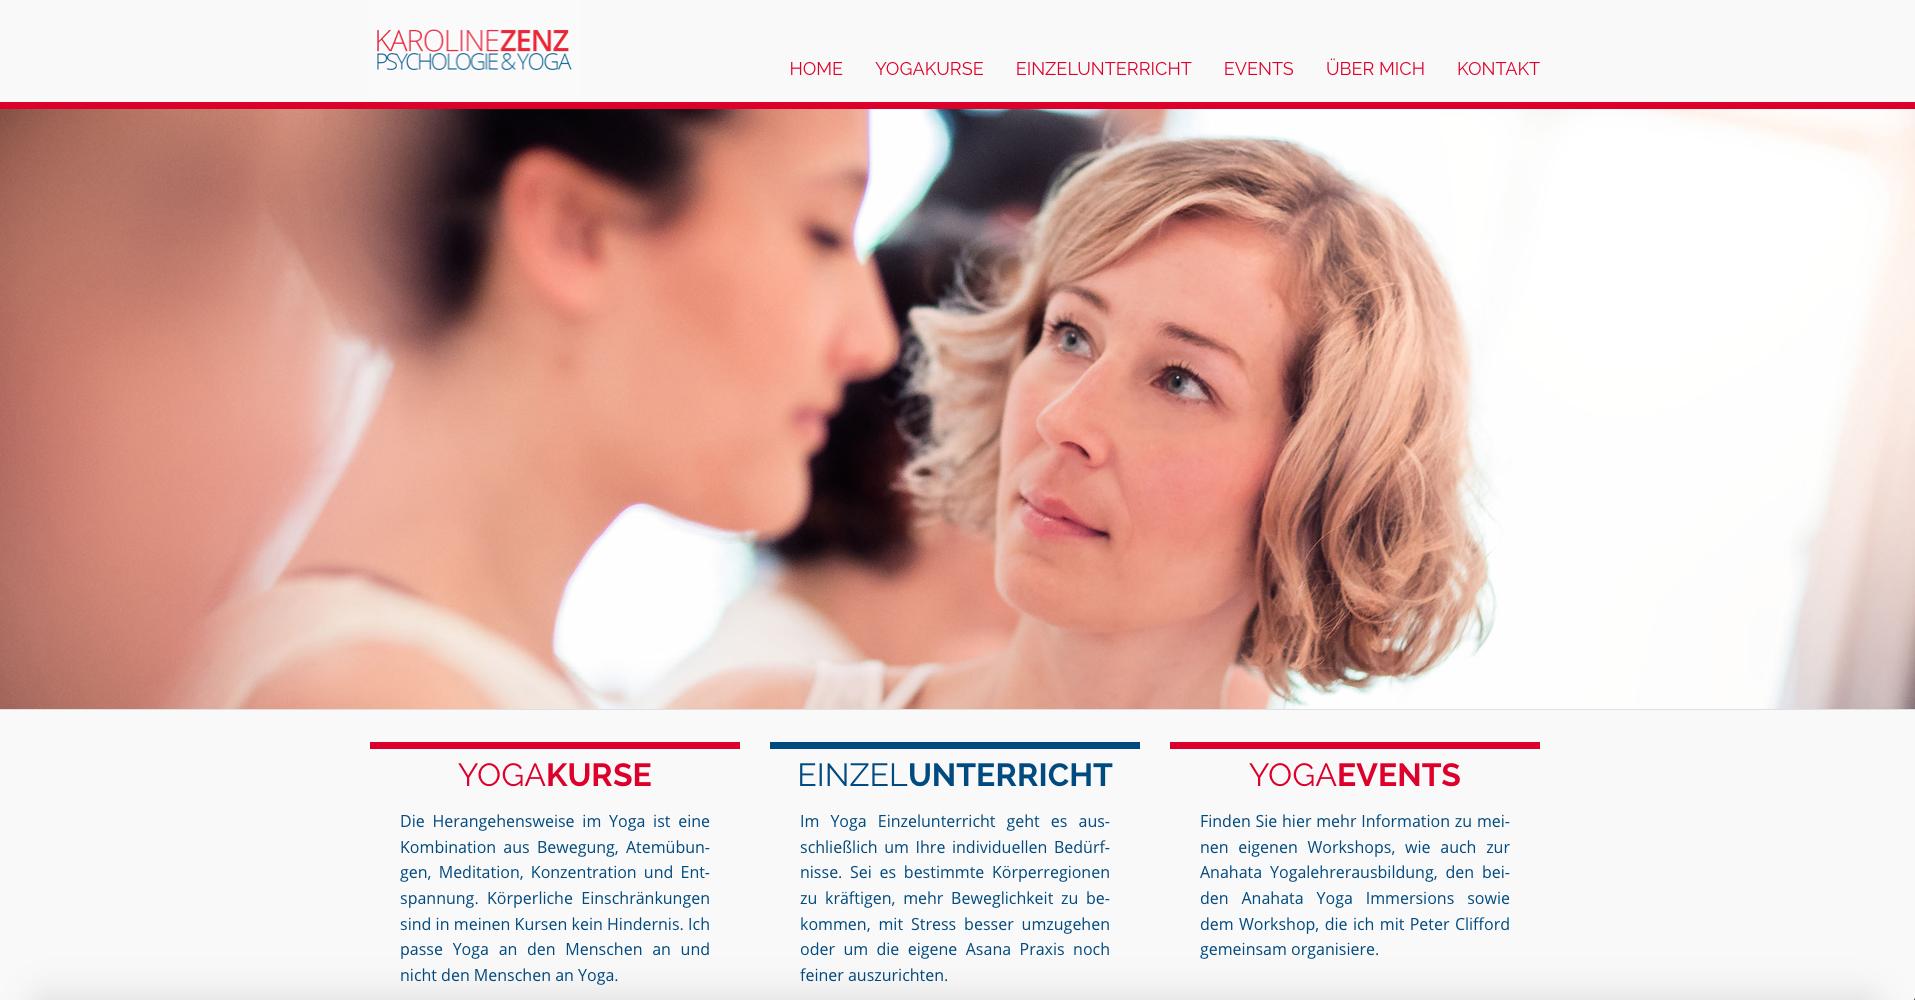 Fresh Herbs Communications Marketing Projektmanagement Website Salzburg_21_Karoline Zenz Yoga